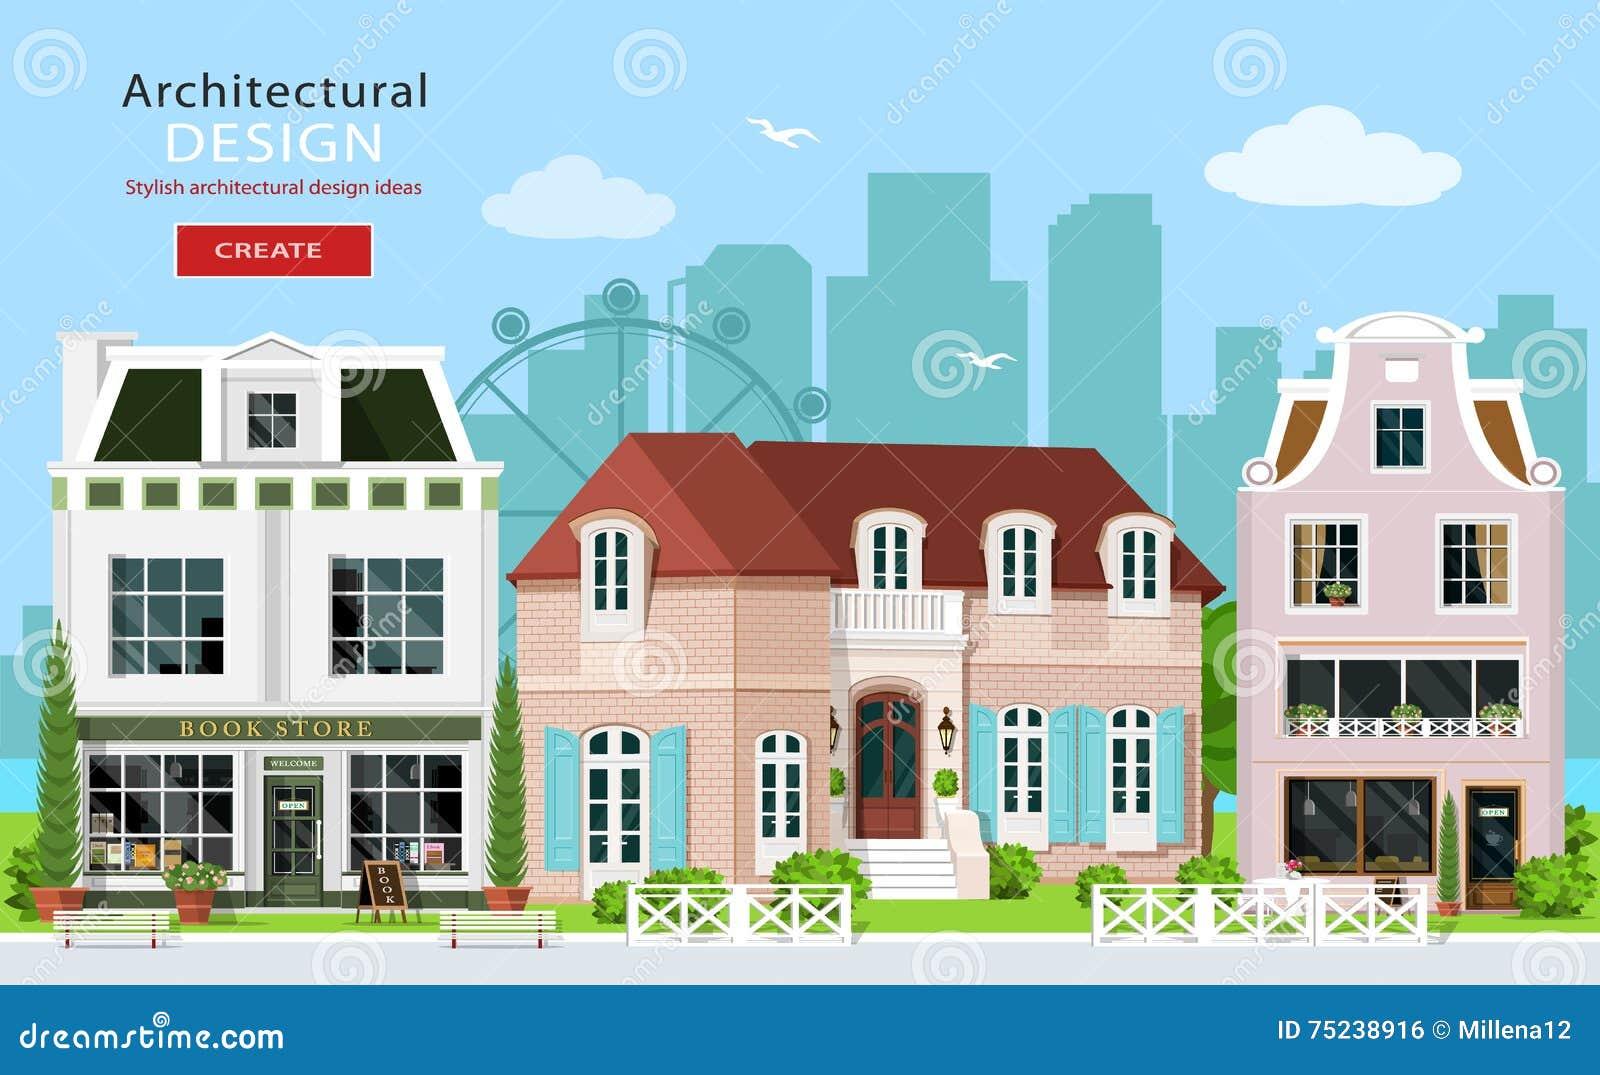 Modern graphic architectural design